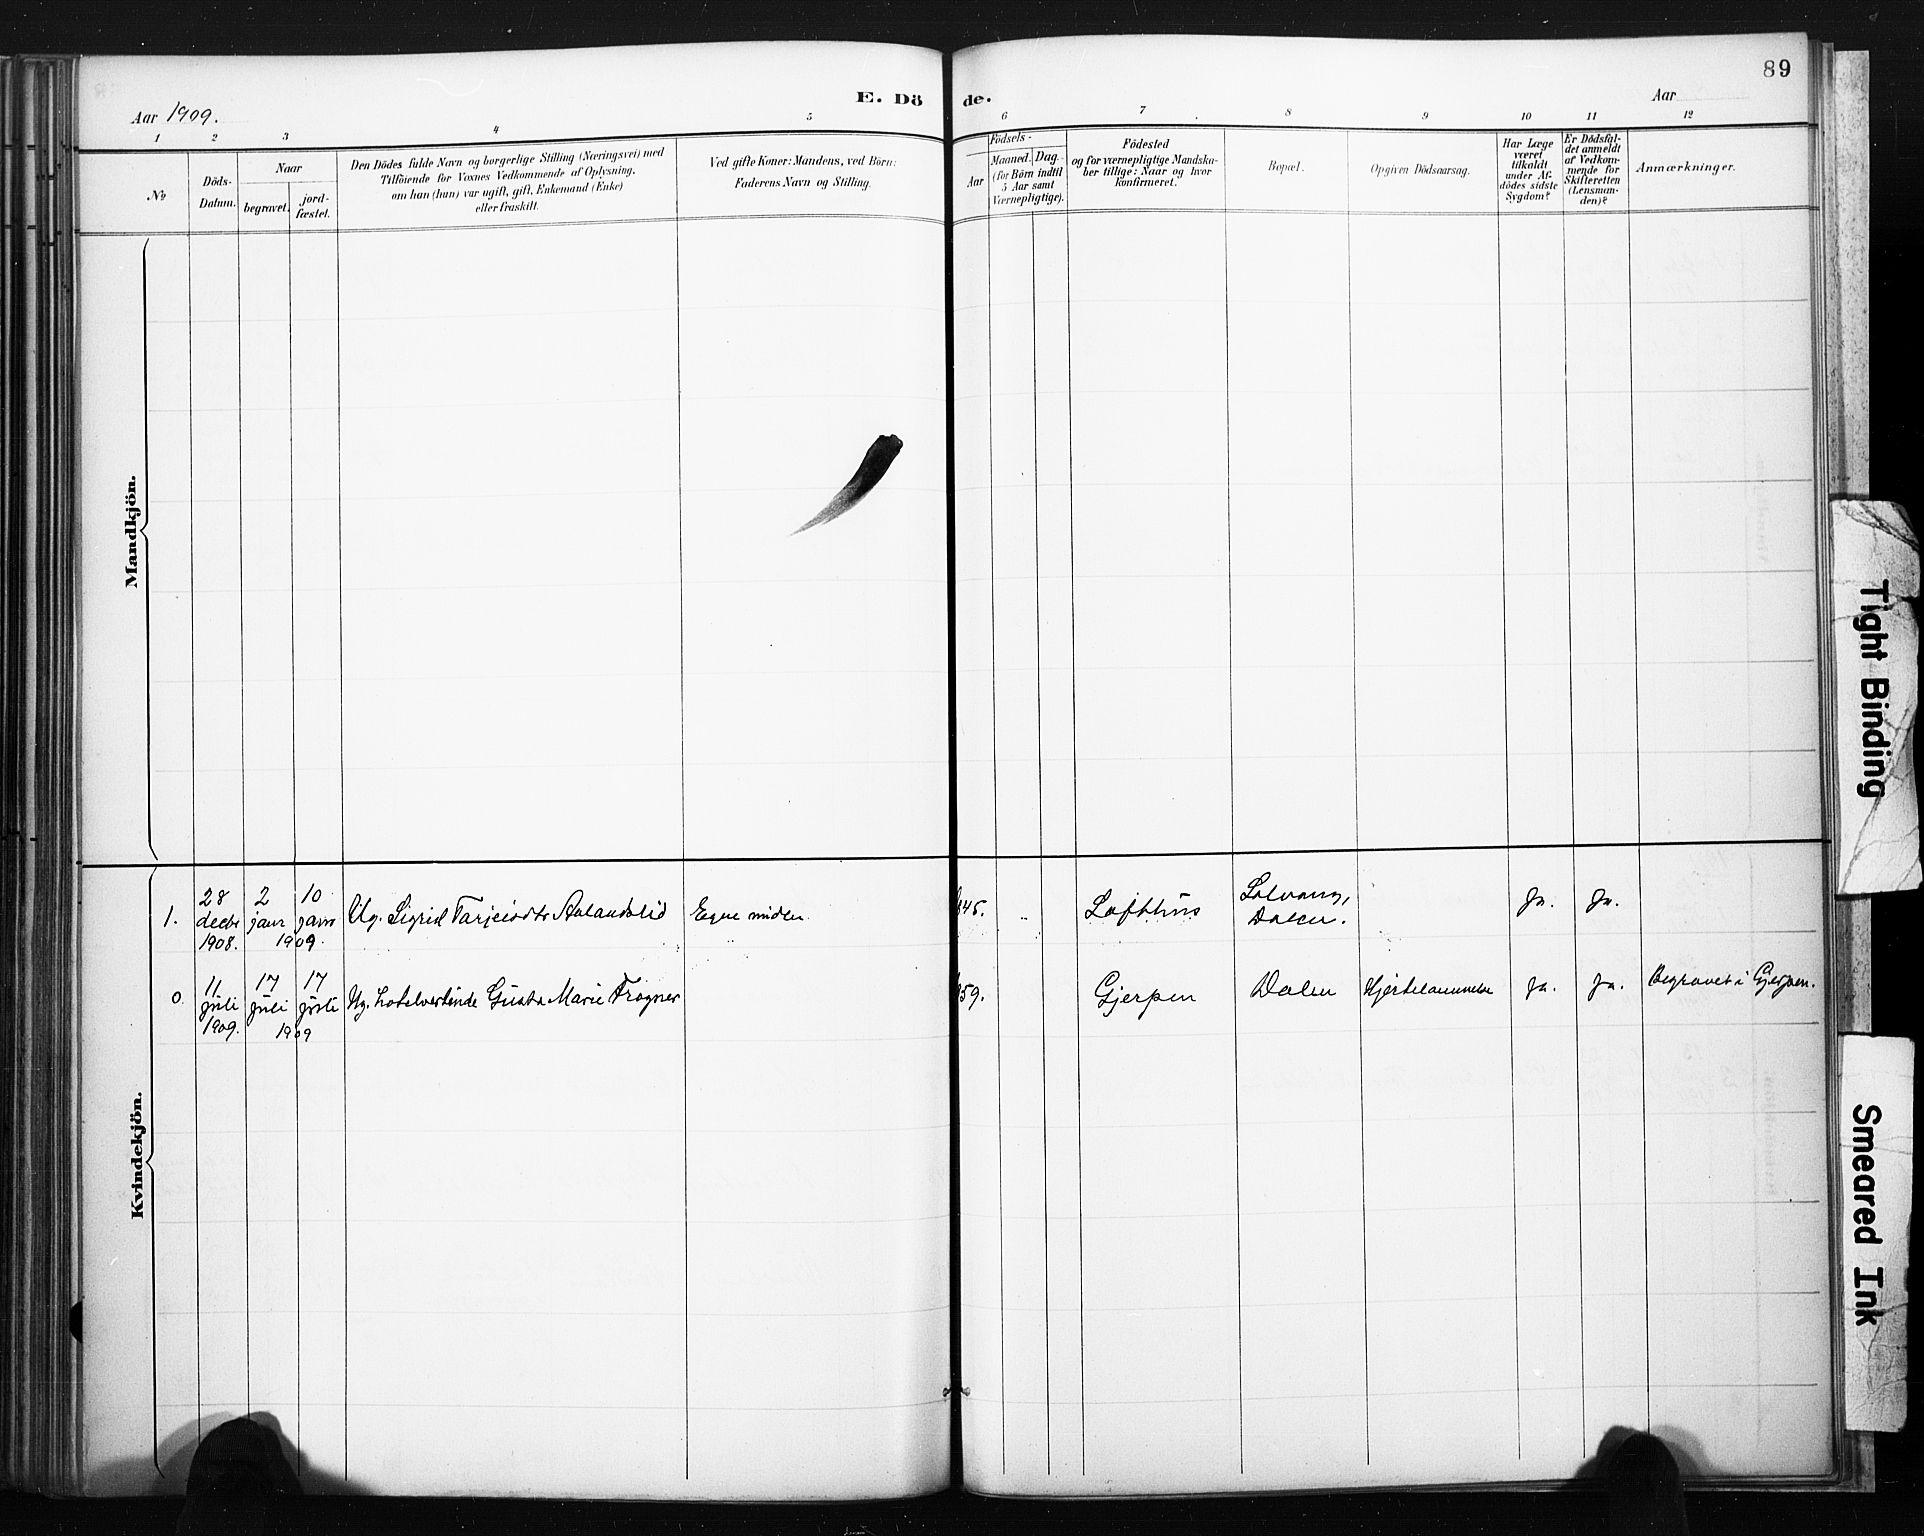 SAKO, Lårdal kirkebøker, F/Fb/L0002: Ministerialbok nr. II 2, 1887-1918, s. 89